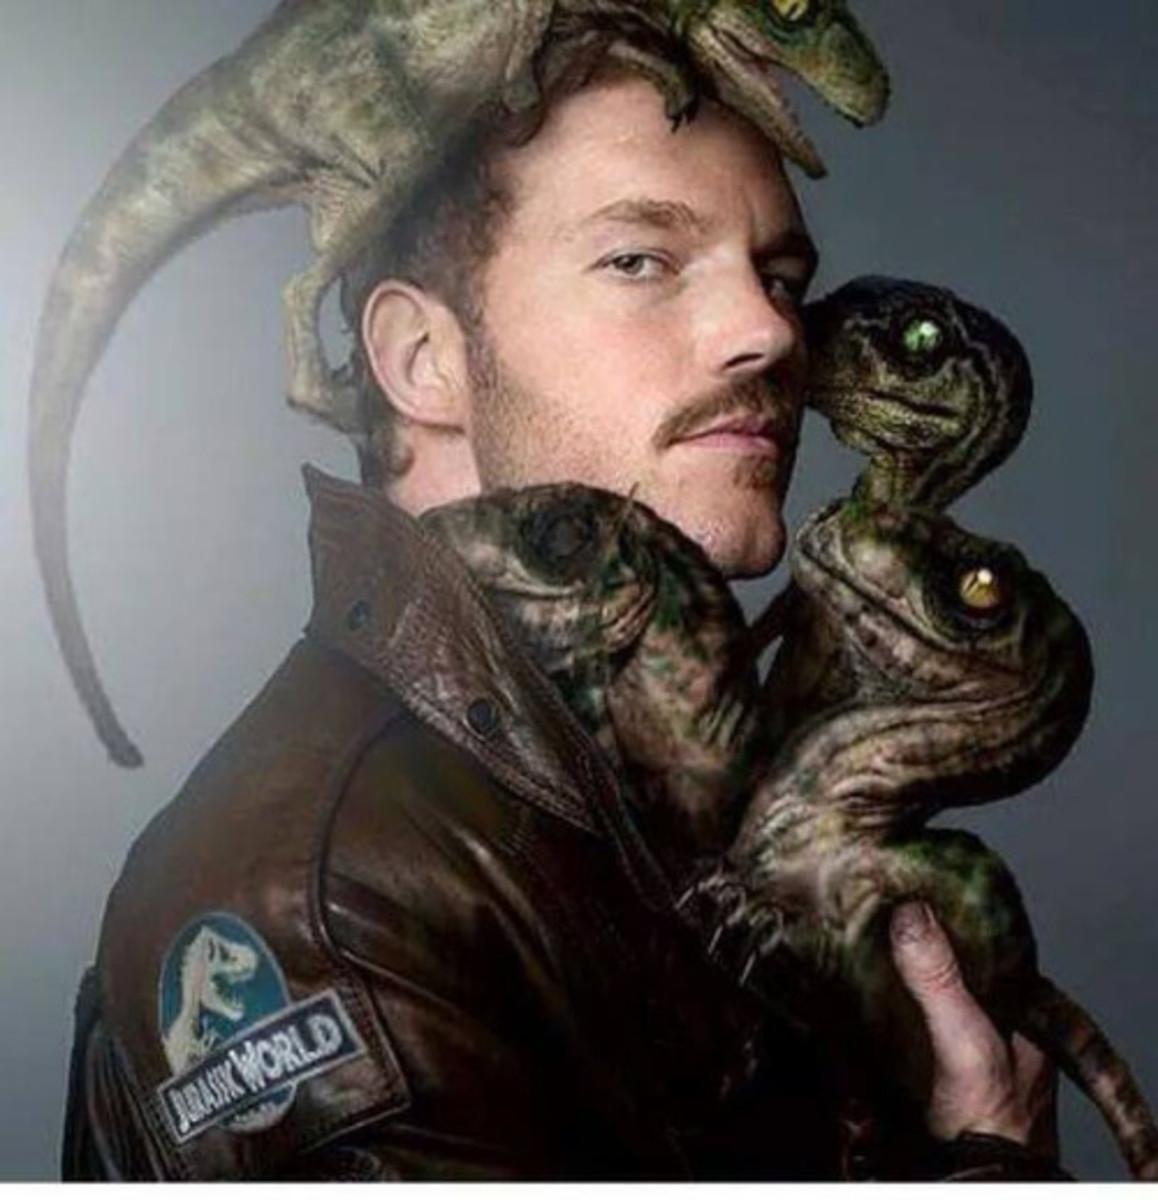 Movie Review: Jurassic World (Spoiler Free)